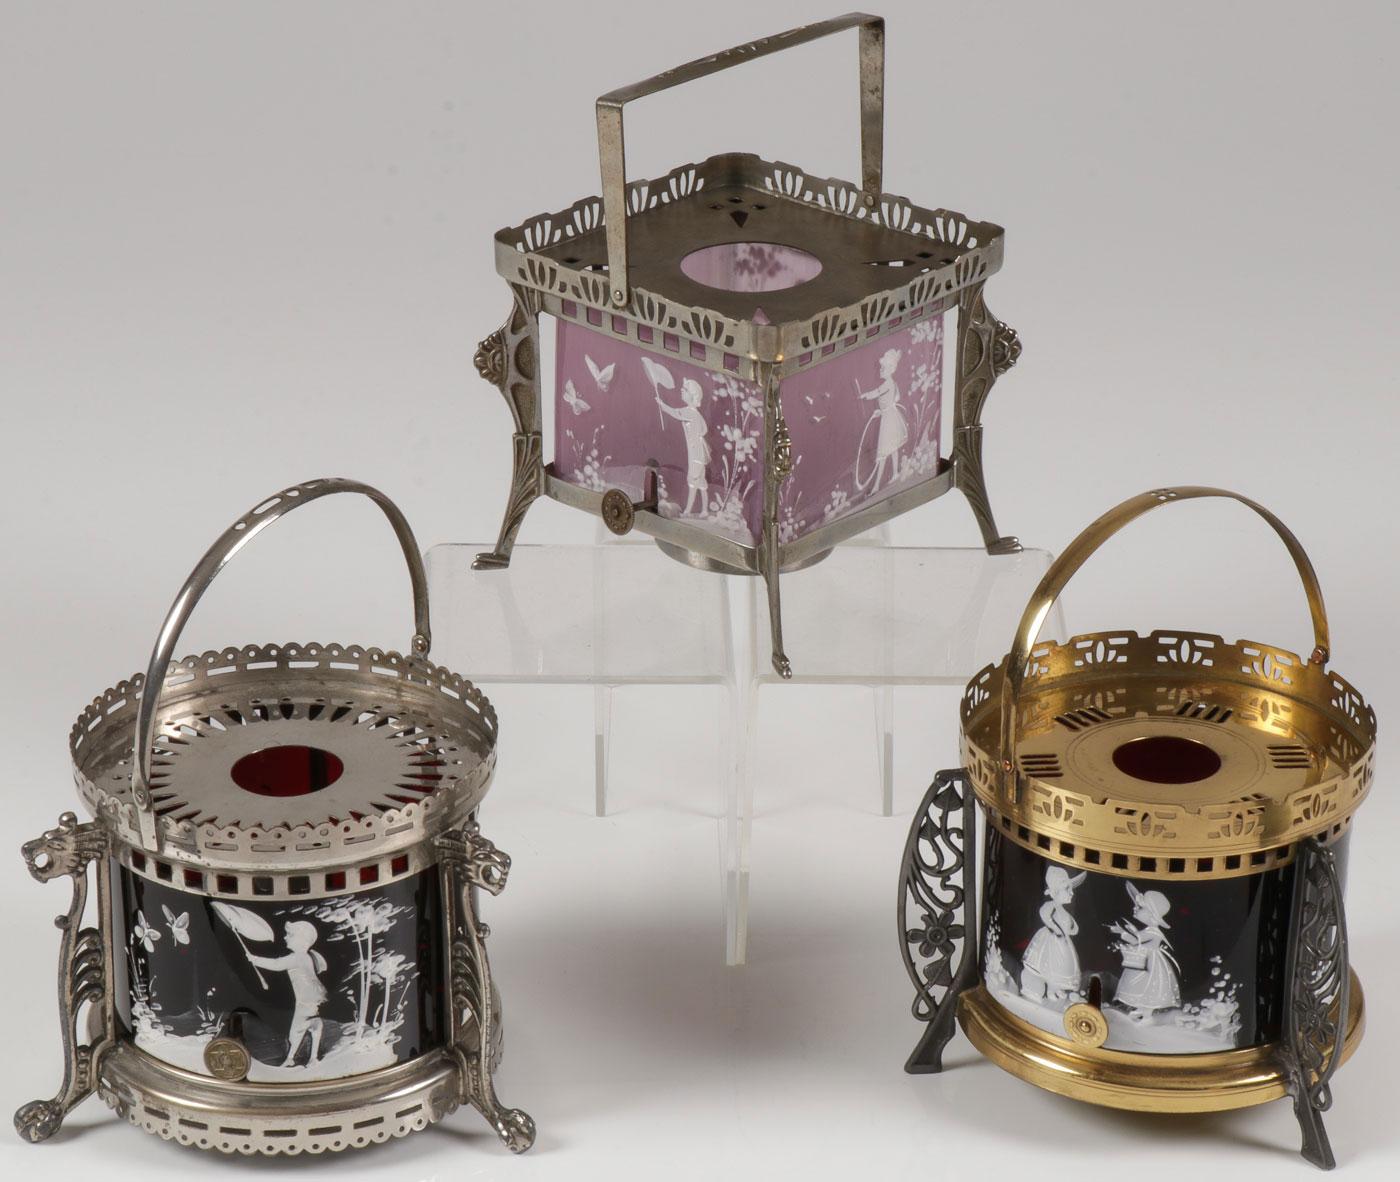 Lot 60 - THREE MARY GREGORY TEA WARMERS